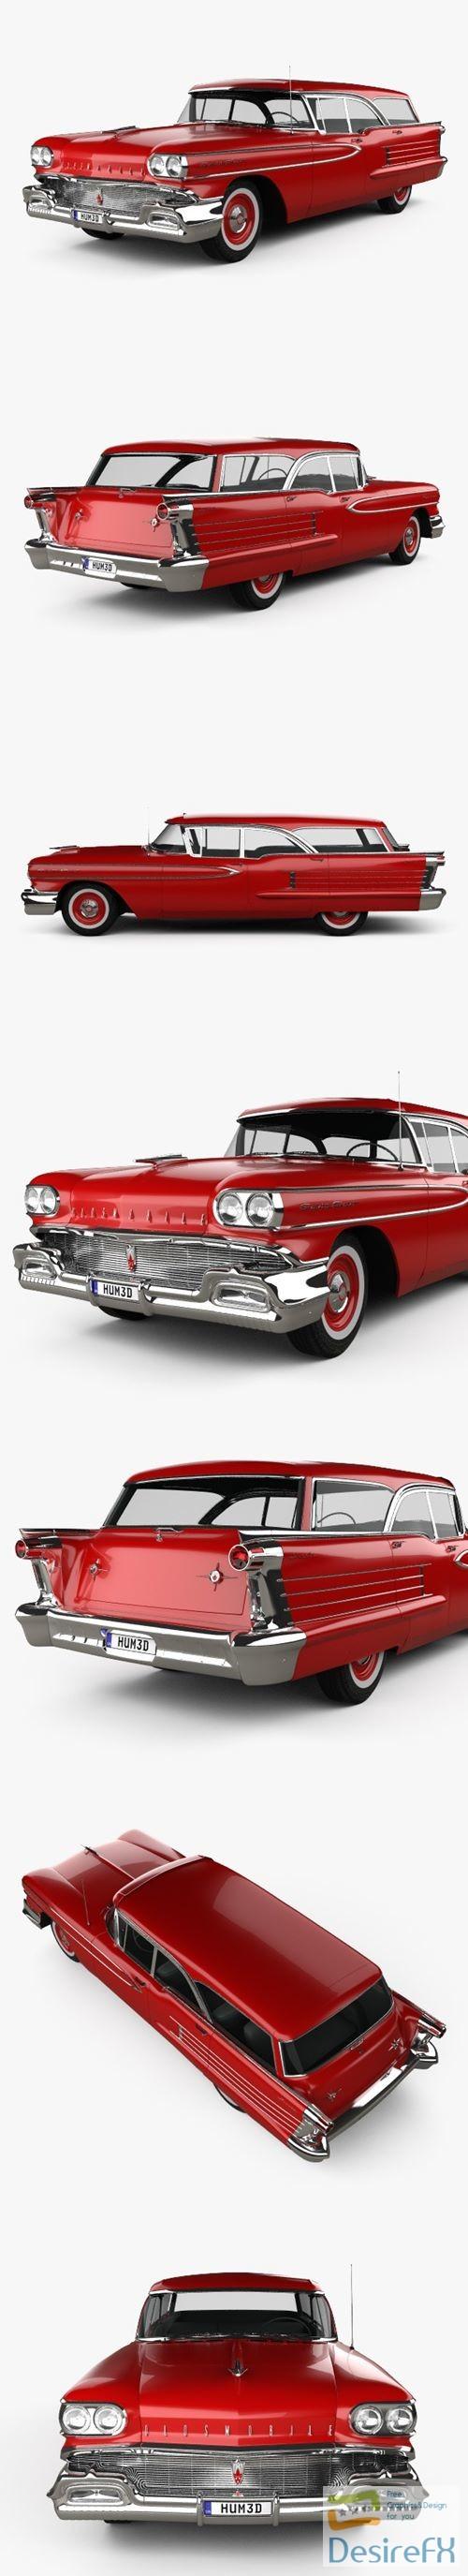 3d-models - Oldsmobile Dynamic 88 Fiesta Holiday 1958 3D Model